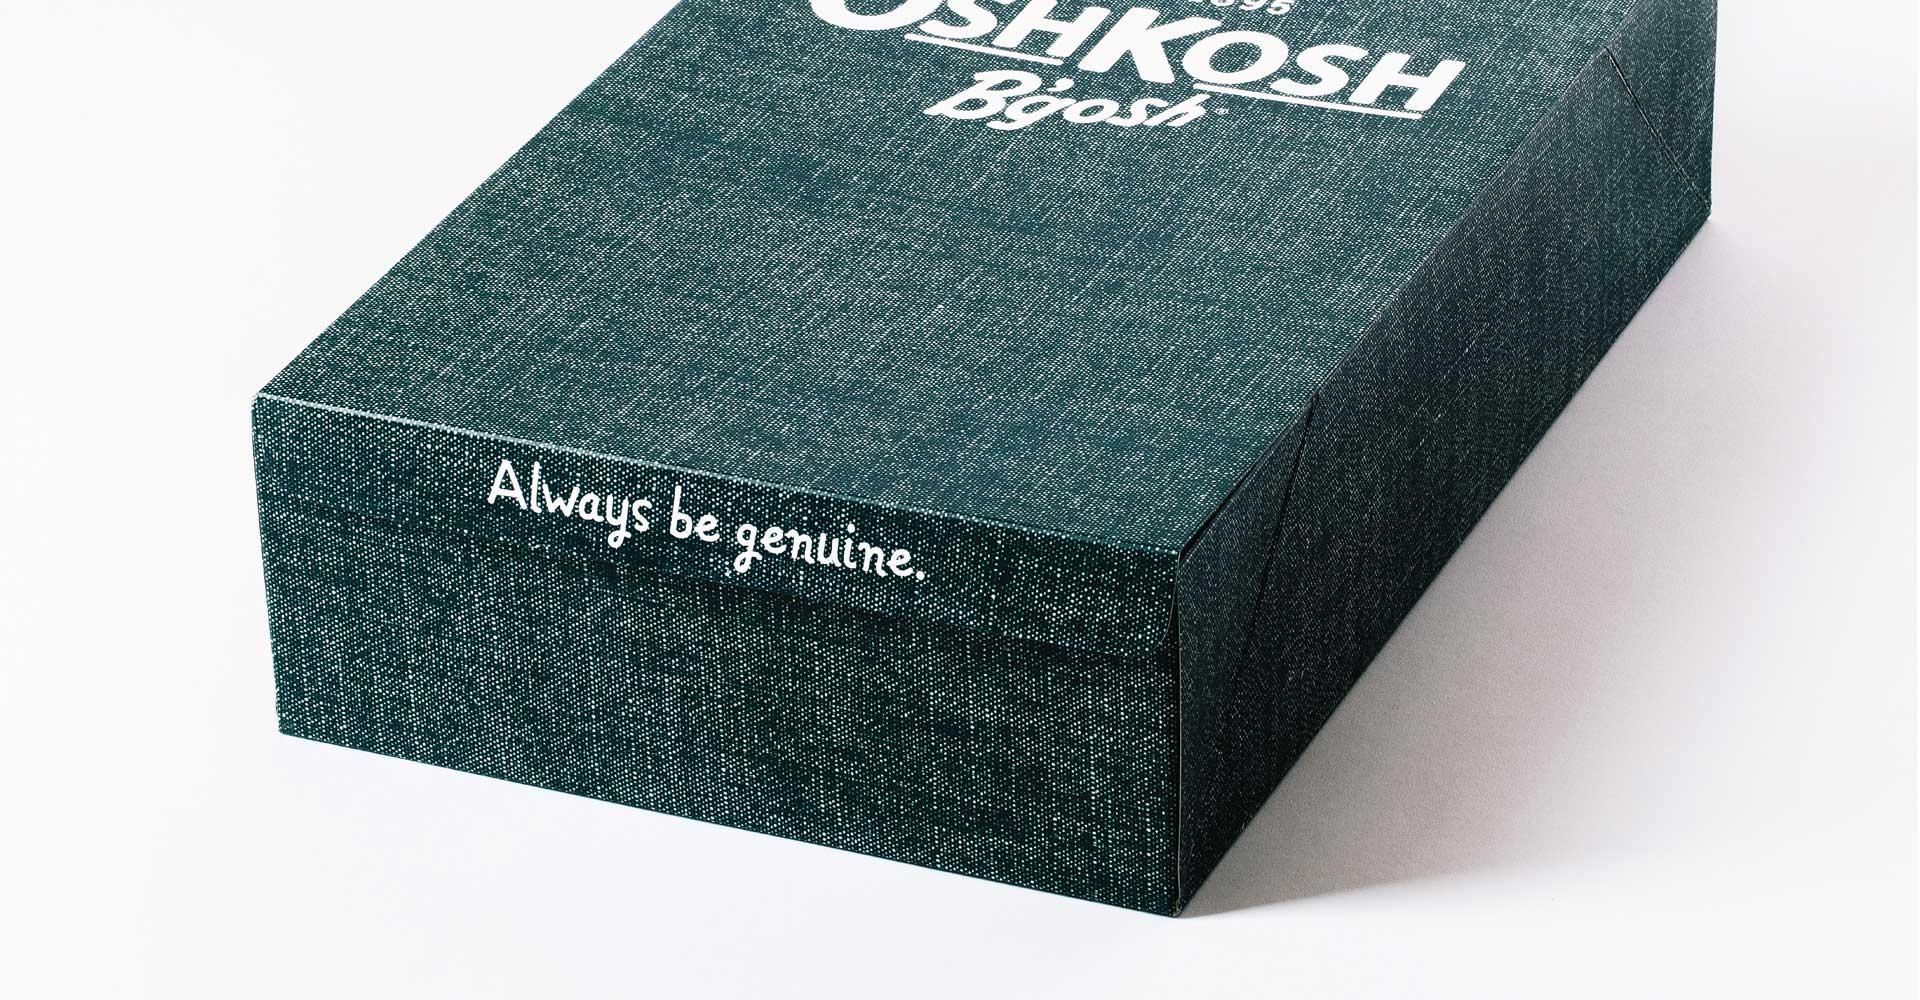 Creative_Retail_Packaging_Package_Design_OshKosh_Bgosh_03.jpg